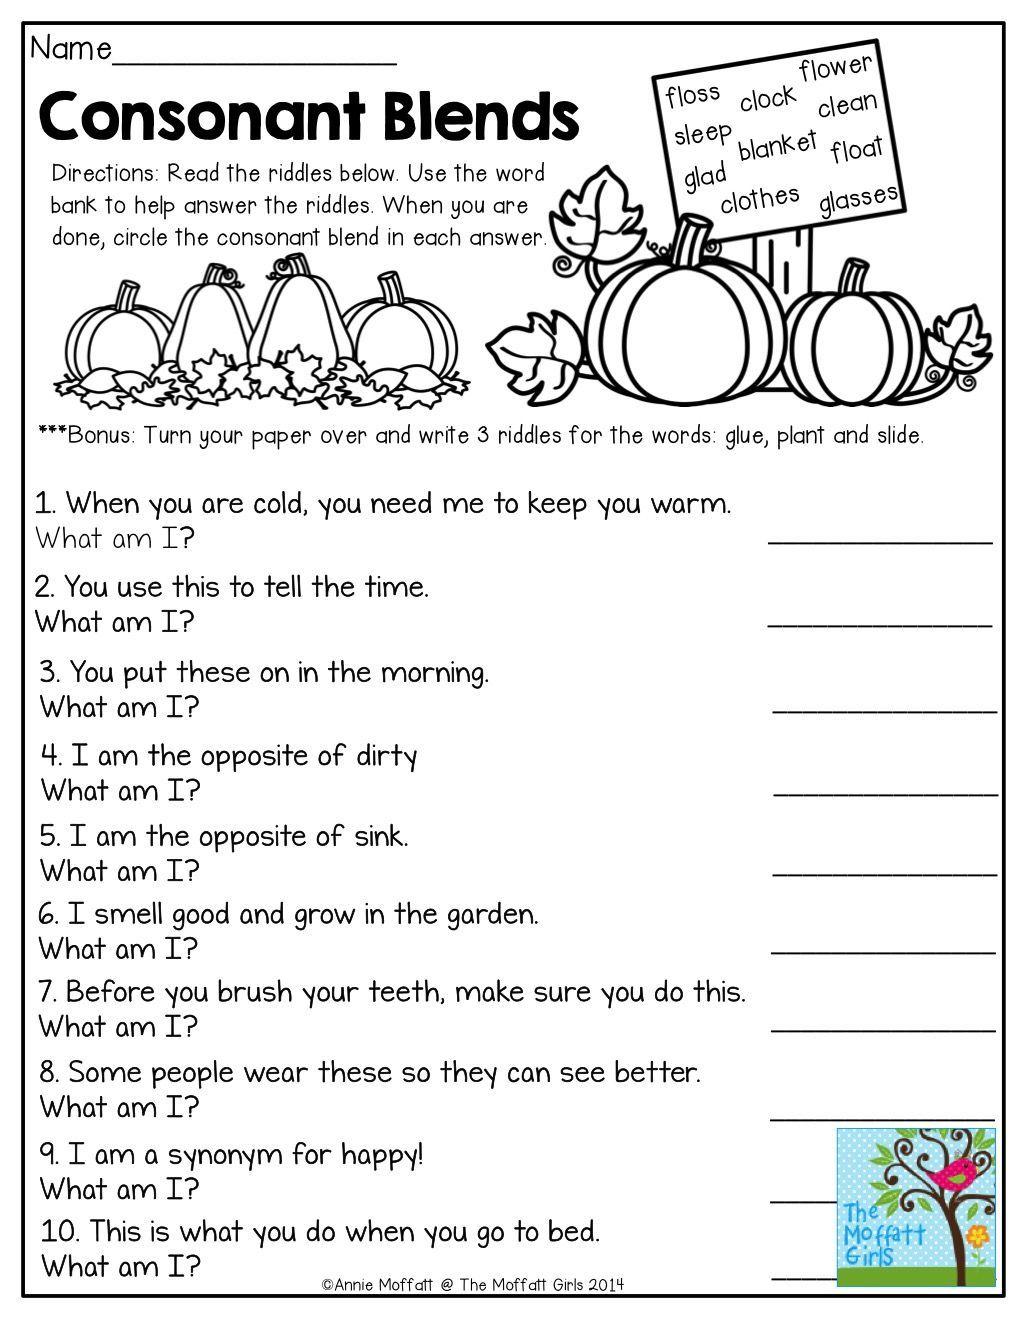 small resolution of Consonant Blends Worksheets For Grade 3   Blends worksheets